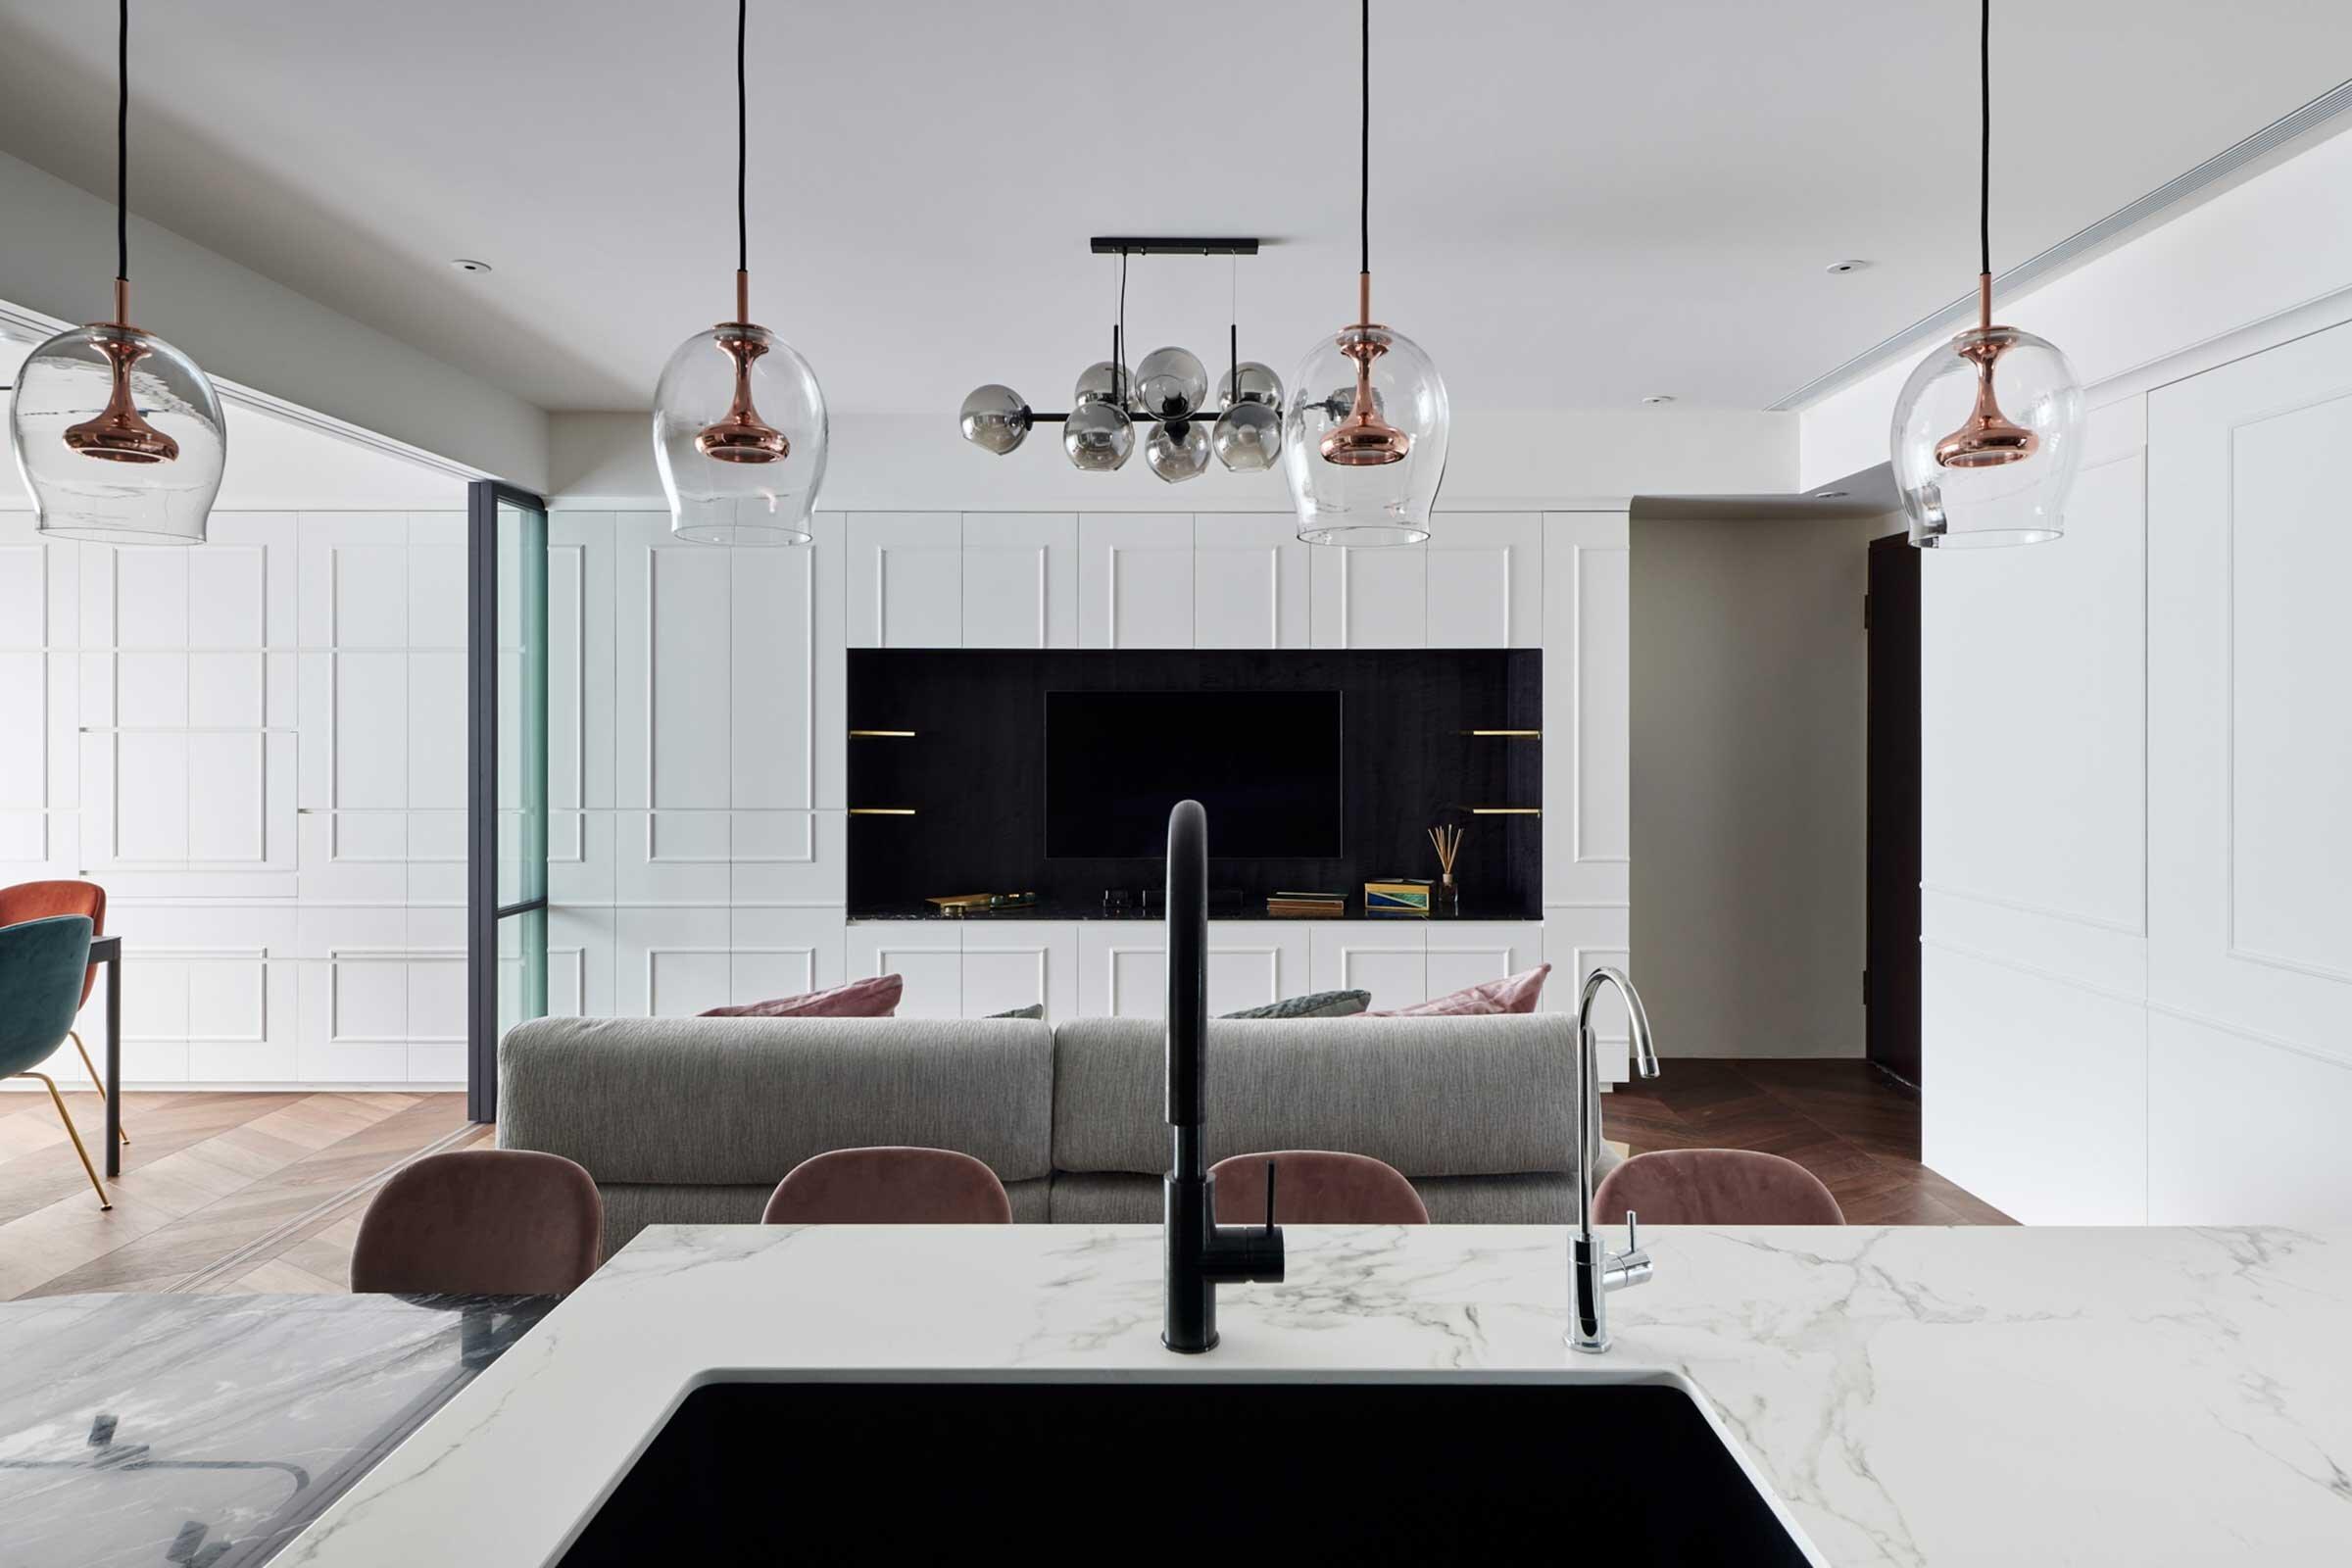 Chen-Studio-Yi-Hsiang-Chao-Architects_DSC0753@0,25x.jpg